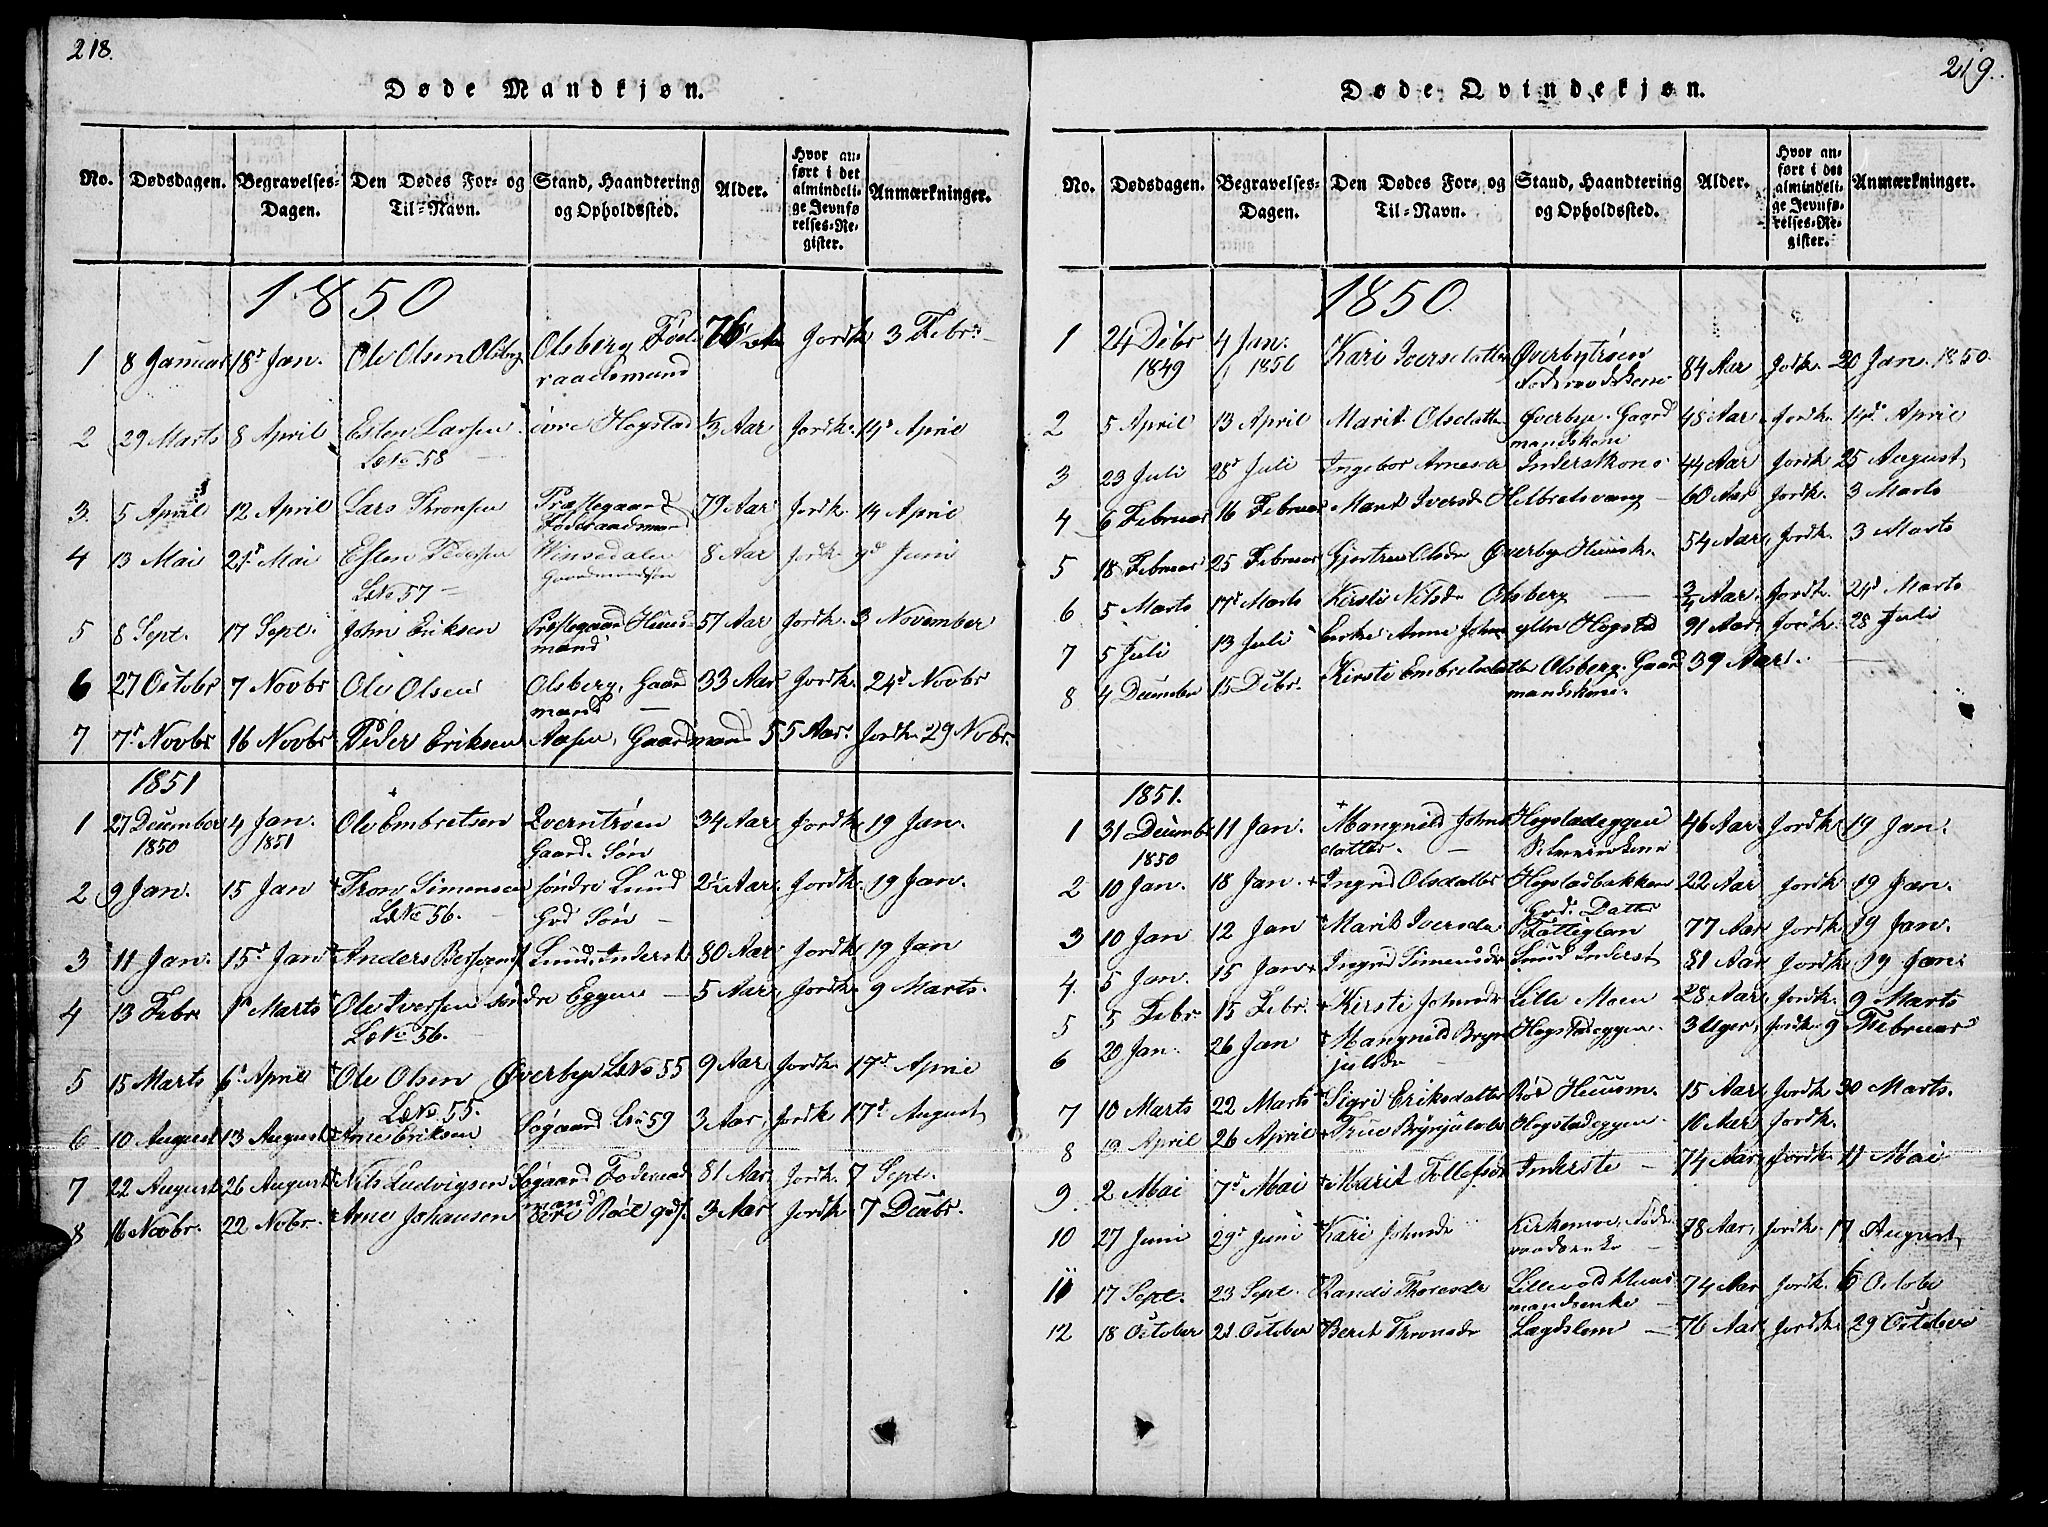 SAH, Tynset prestekontor, Klokkerbok nr. 4, 1814-1879, s. 218-219